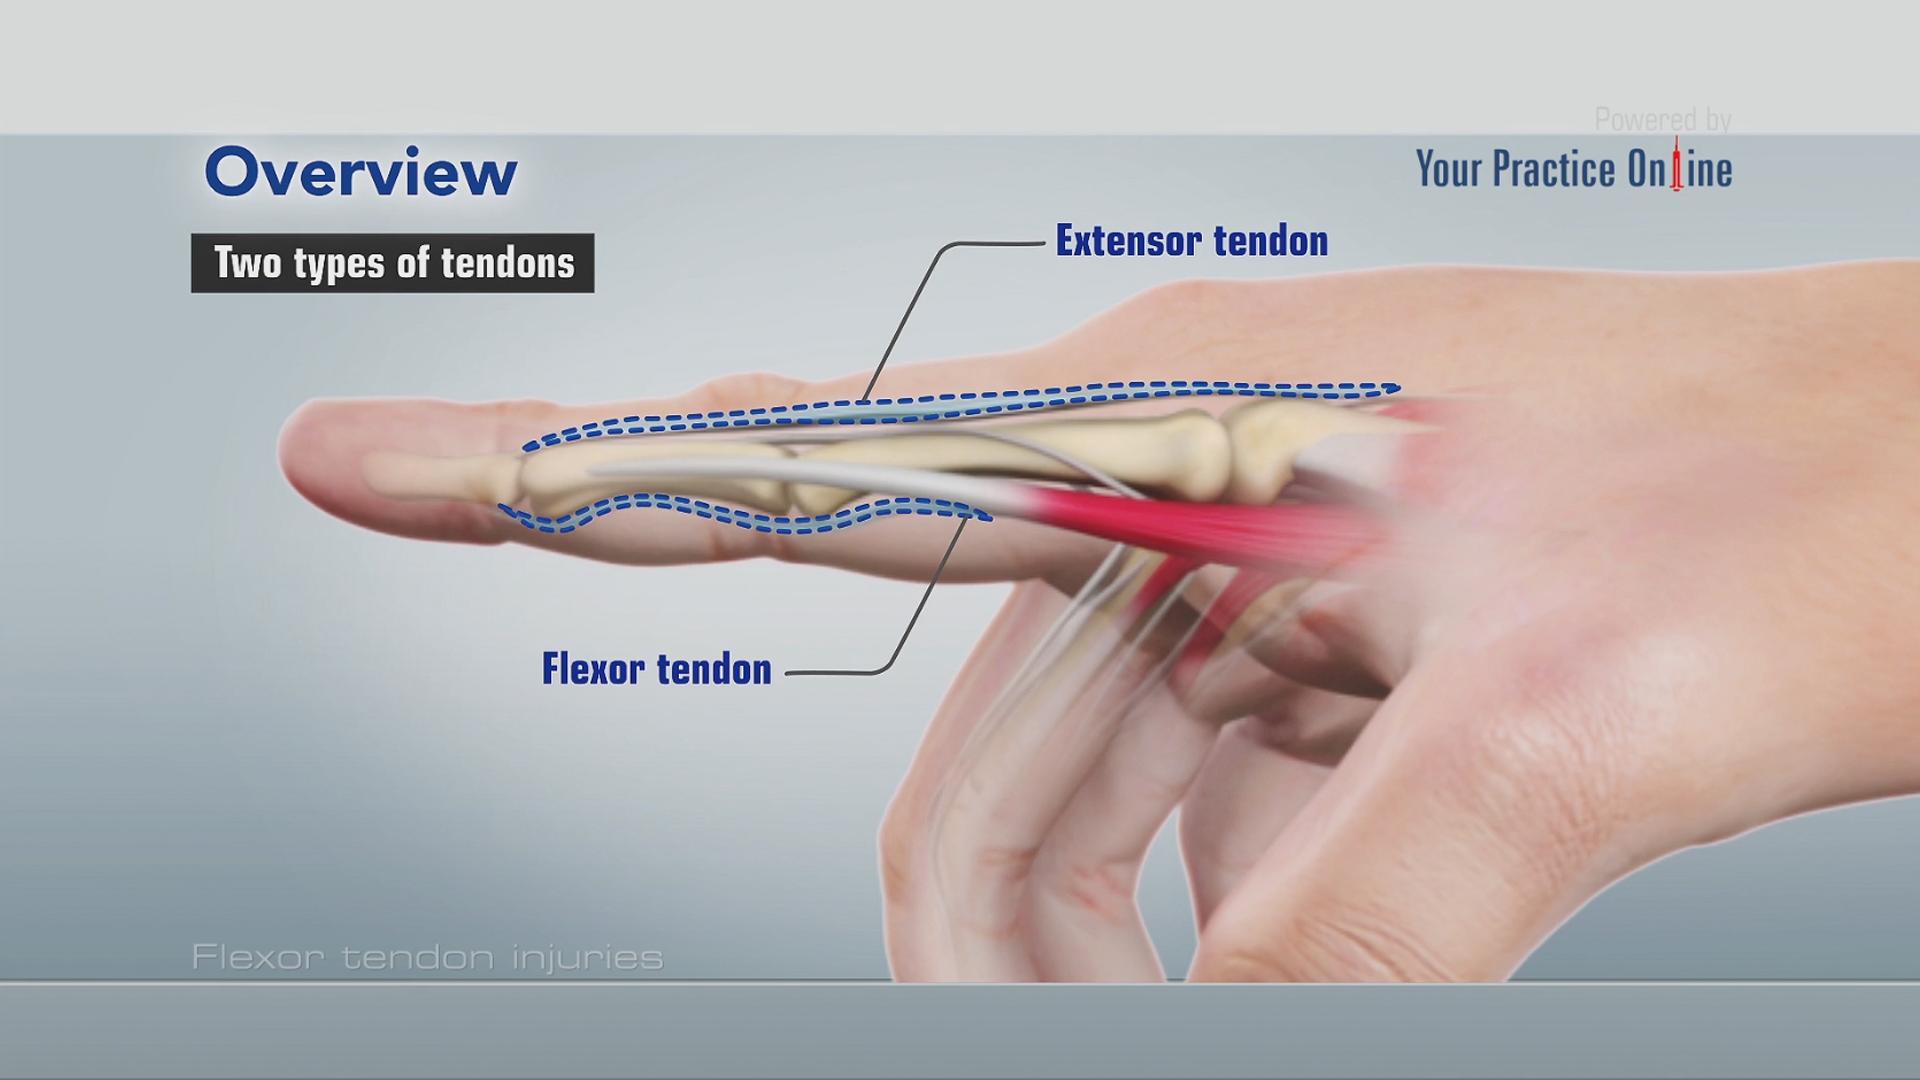 flexor tendon injuries | hand & wrist orthopaedics videos | your practice  online education